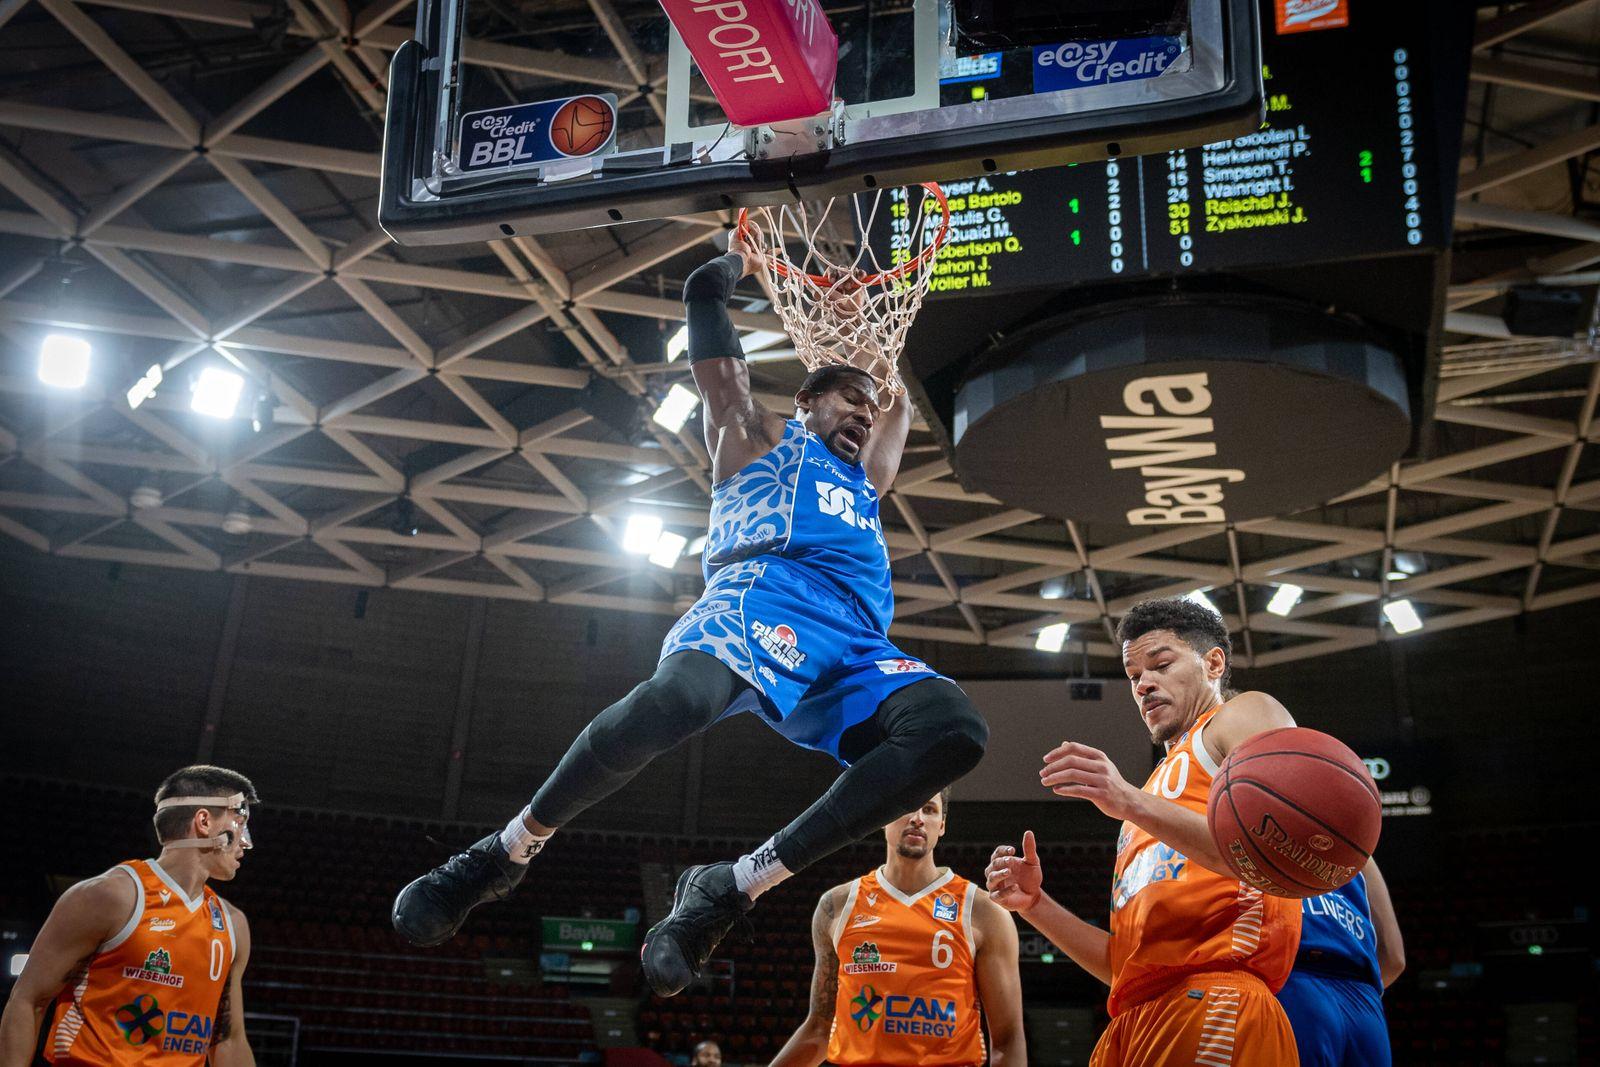 Basketball easyCredit BBL Final-Turnier Basketball München 11.06.2020 Saison 2019 / 2020 easyCredit BBL Final-Turnier 2